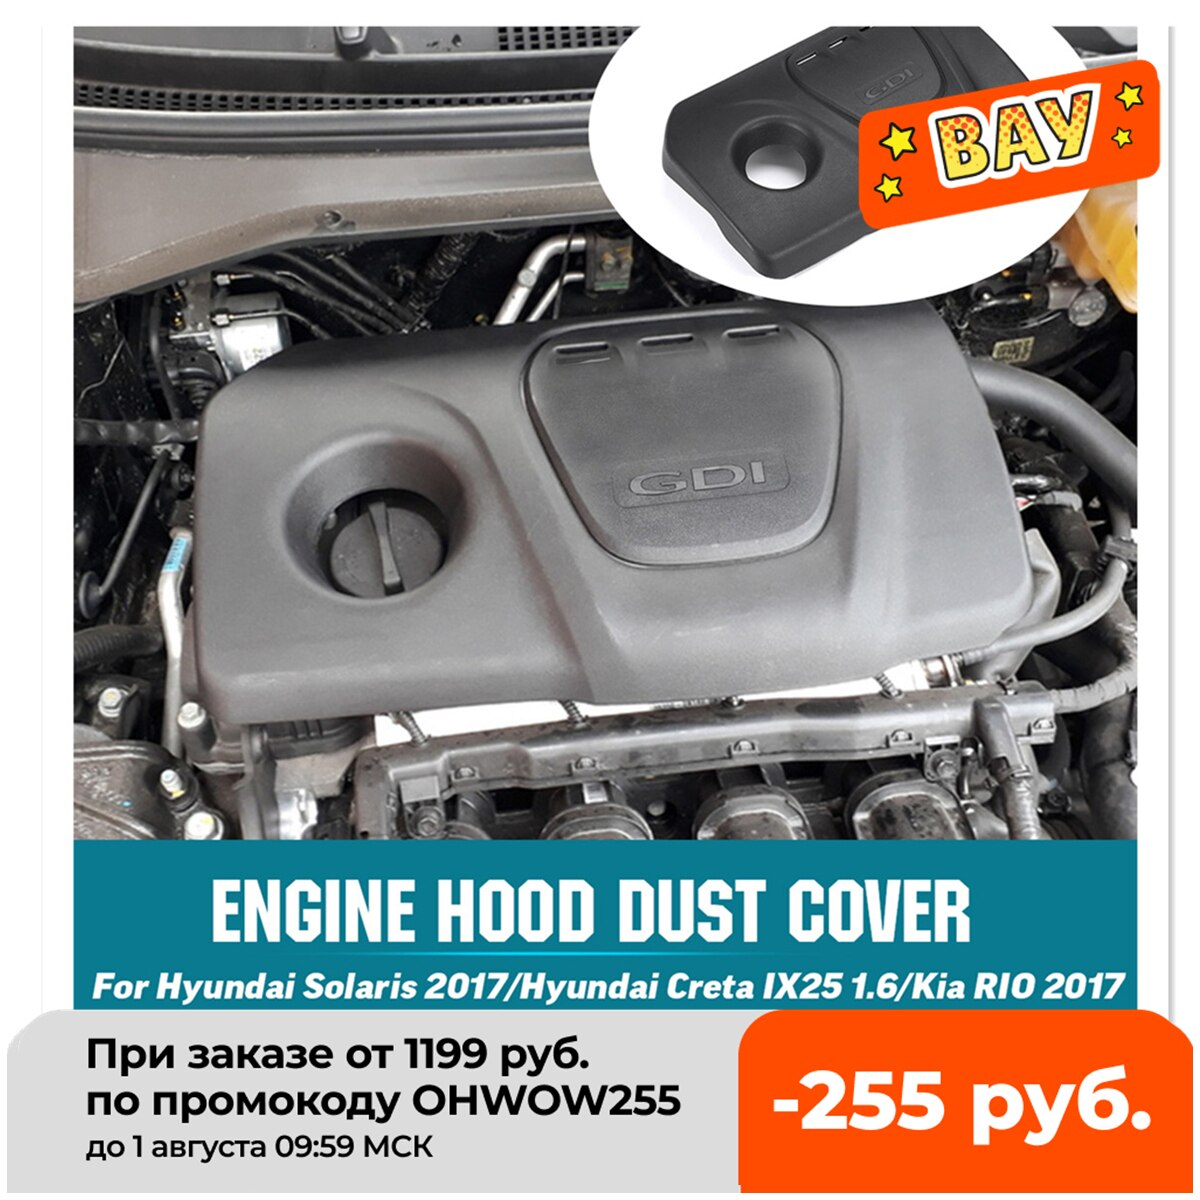 غطاء غبار المحرك الأمامي ، غطاء المحرك 292402B930 ، لشركة Hyundai Solaris Creta IX25 1.6 1.6L ، Kia RIO 2017 ، Sonata Tucson